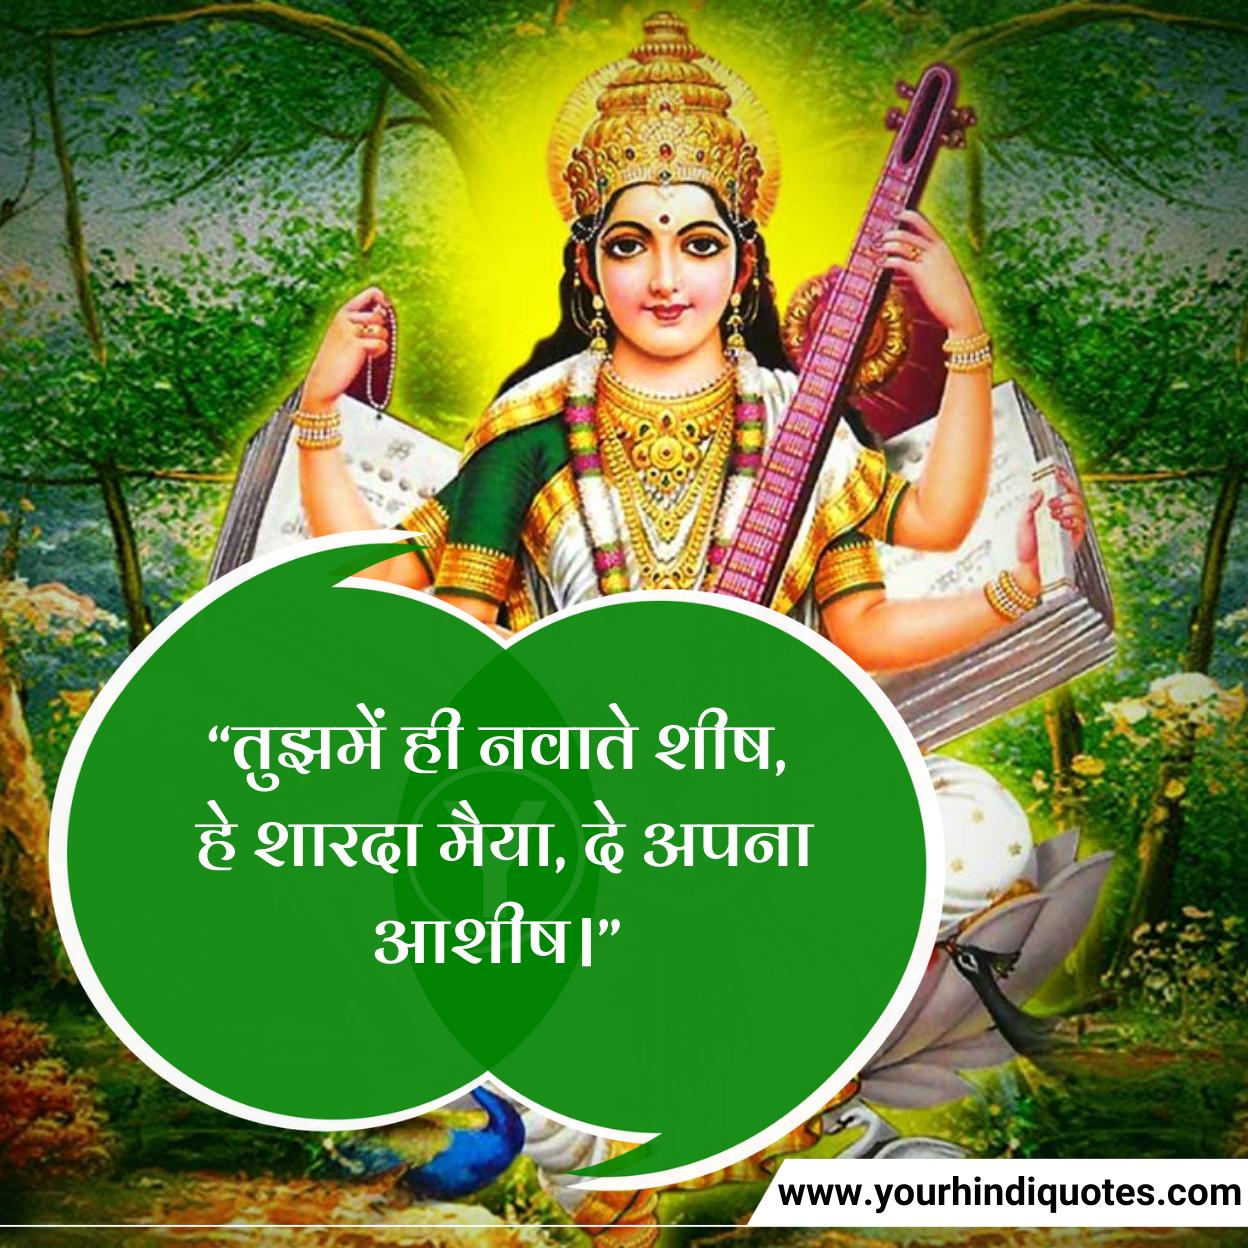 Saraswati Mantra in Hind